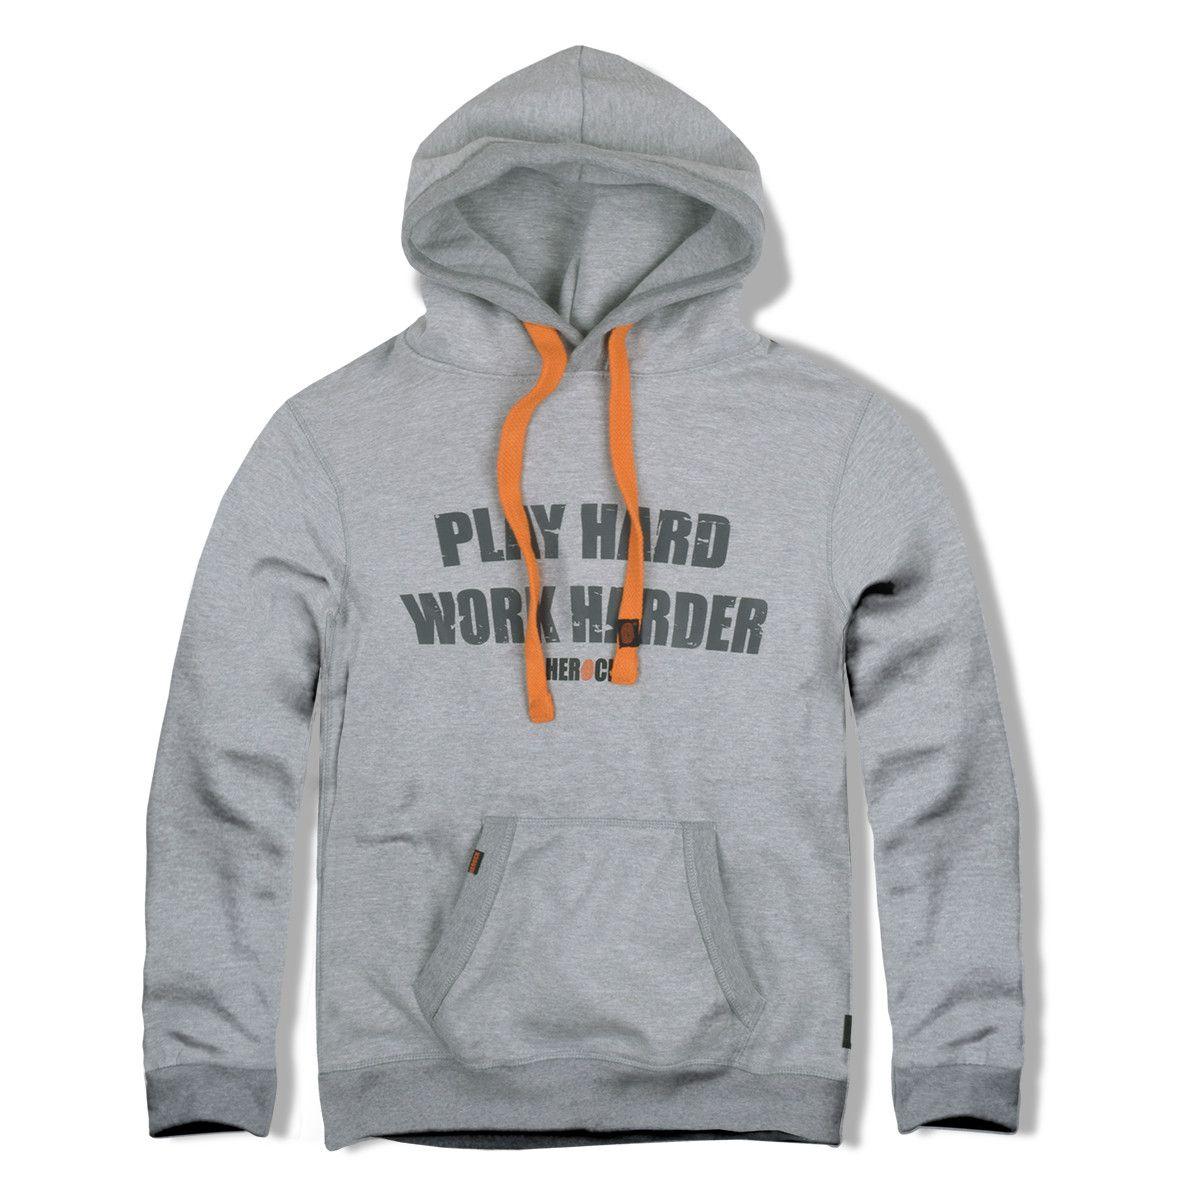 HRCK Wonbel Long Sleeve B Quality Pullover Hoodie   #elo #exportleftovers #polorepublica